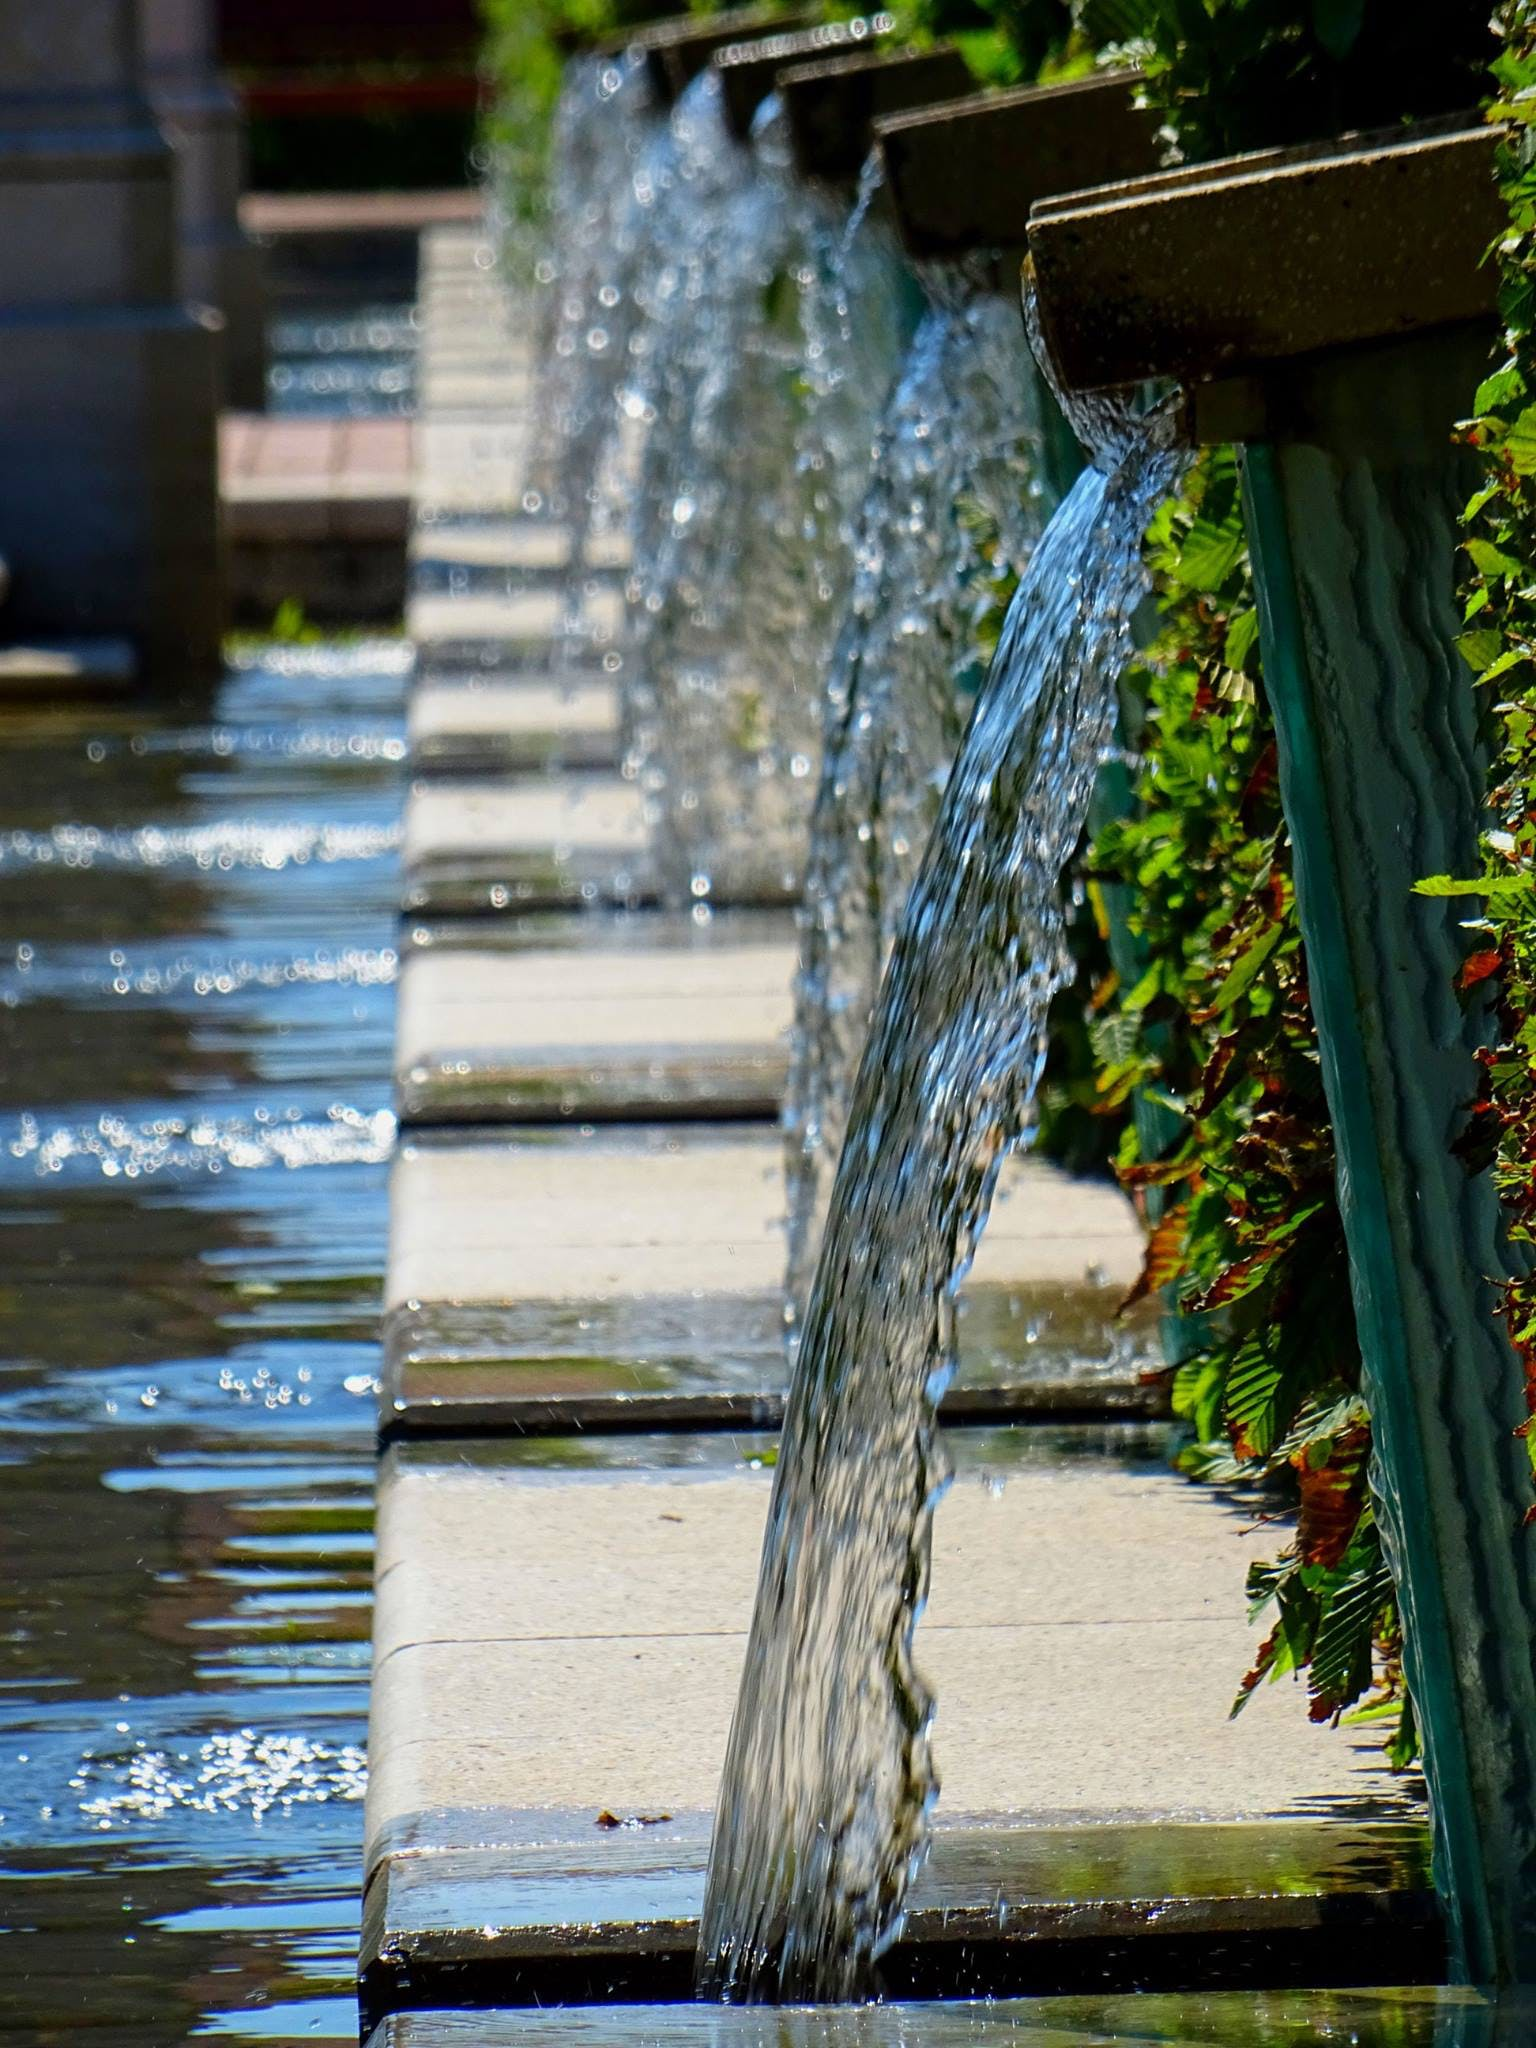 Free stock photo of water, garden, stream, fountain